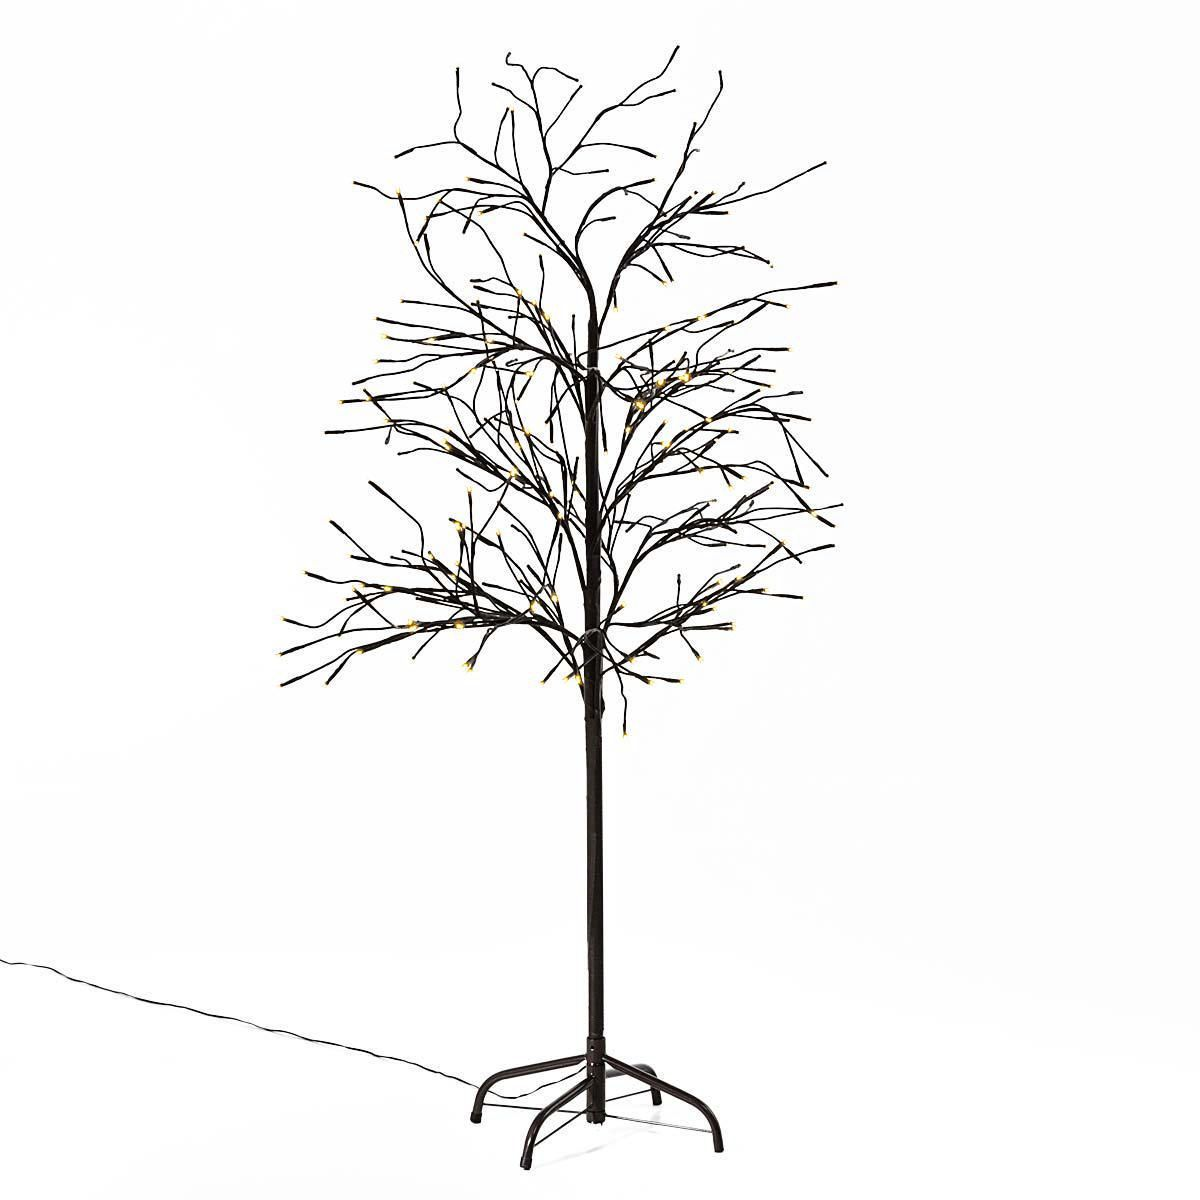 Weihnachtsbeleuchtung Led Baum.Led Baum Trauerweide Warmweiß Outdoorgeeignet Ca H150 Cm